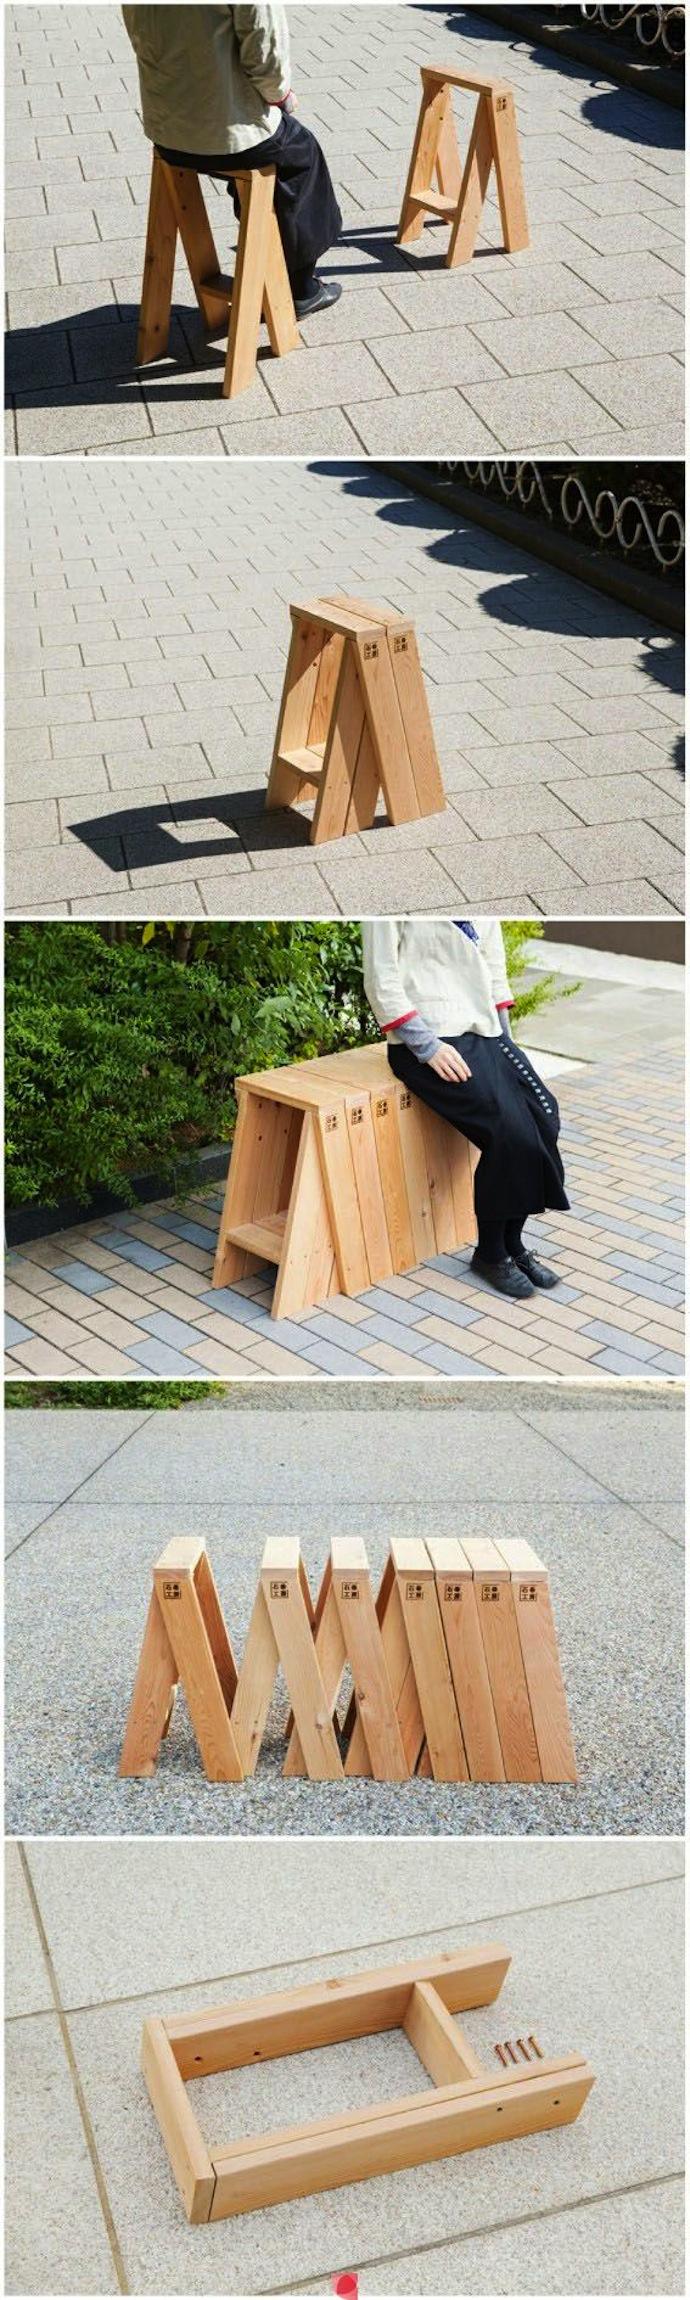 bench_stool